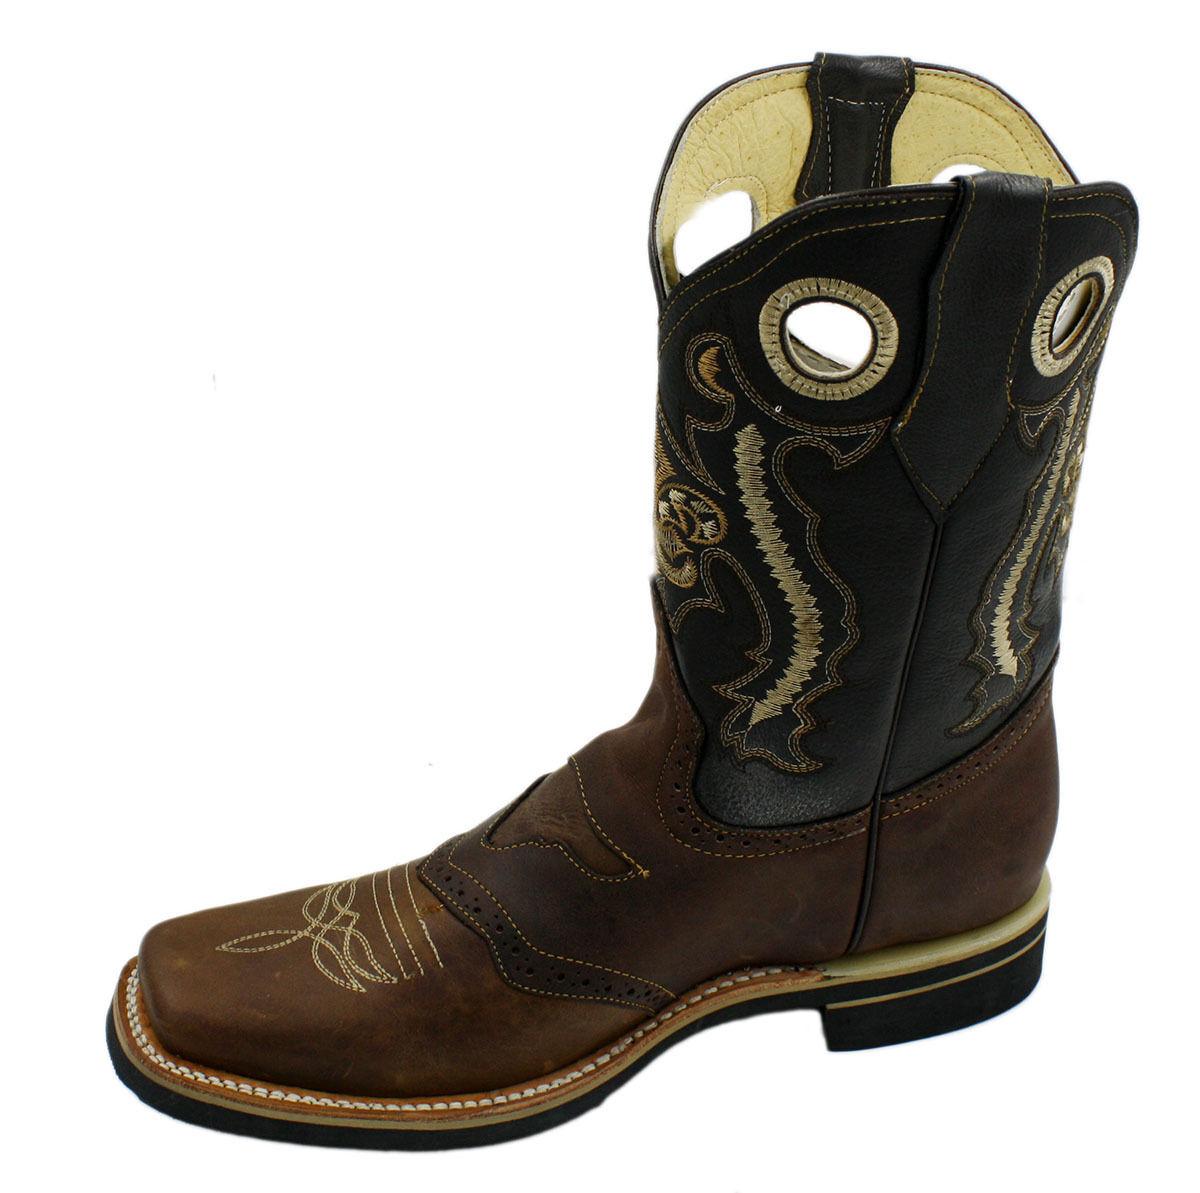 Uomo Senuine Quality Cowhide Pelle Cowboy Western Stivali Style CR 454